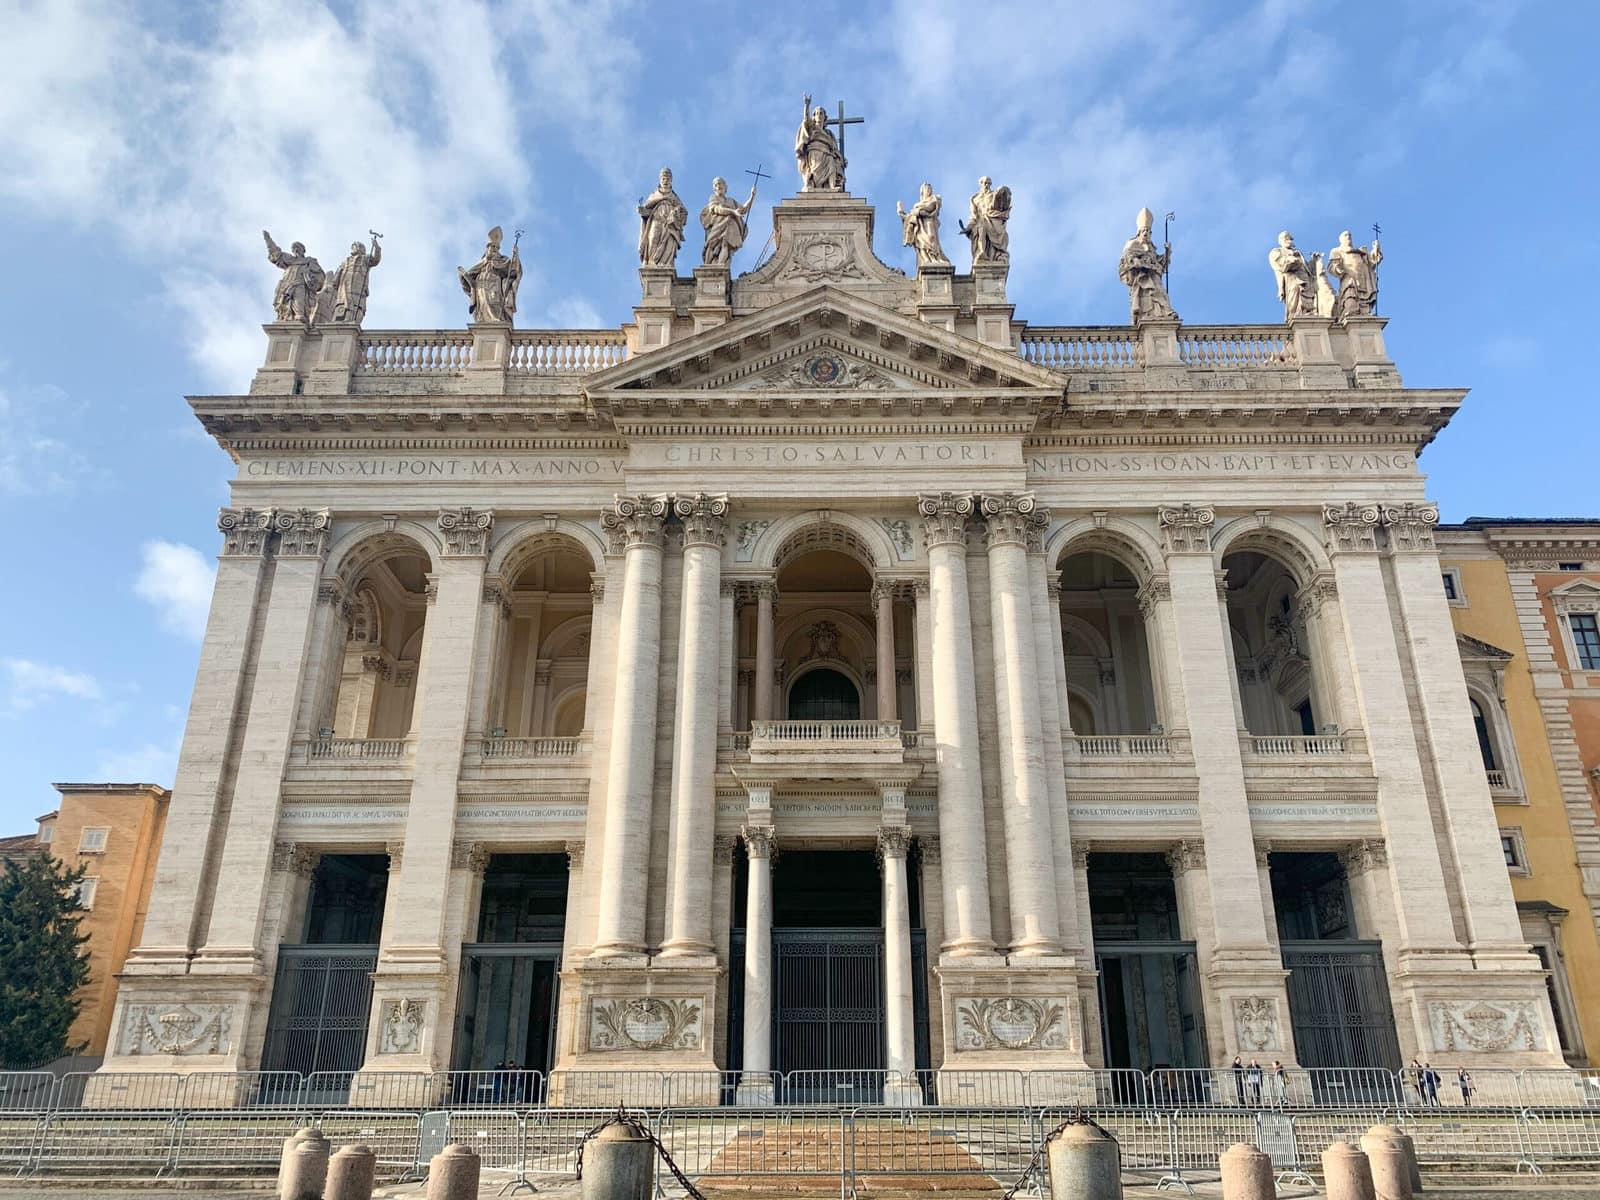 Der Lateran in Rom: Haupteingang